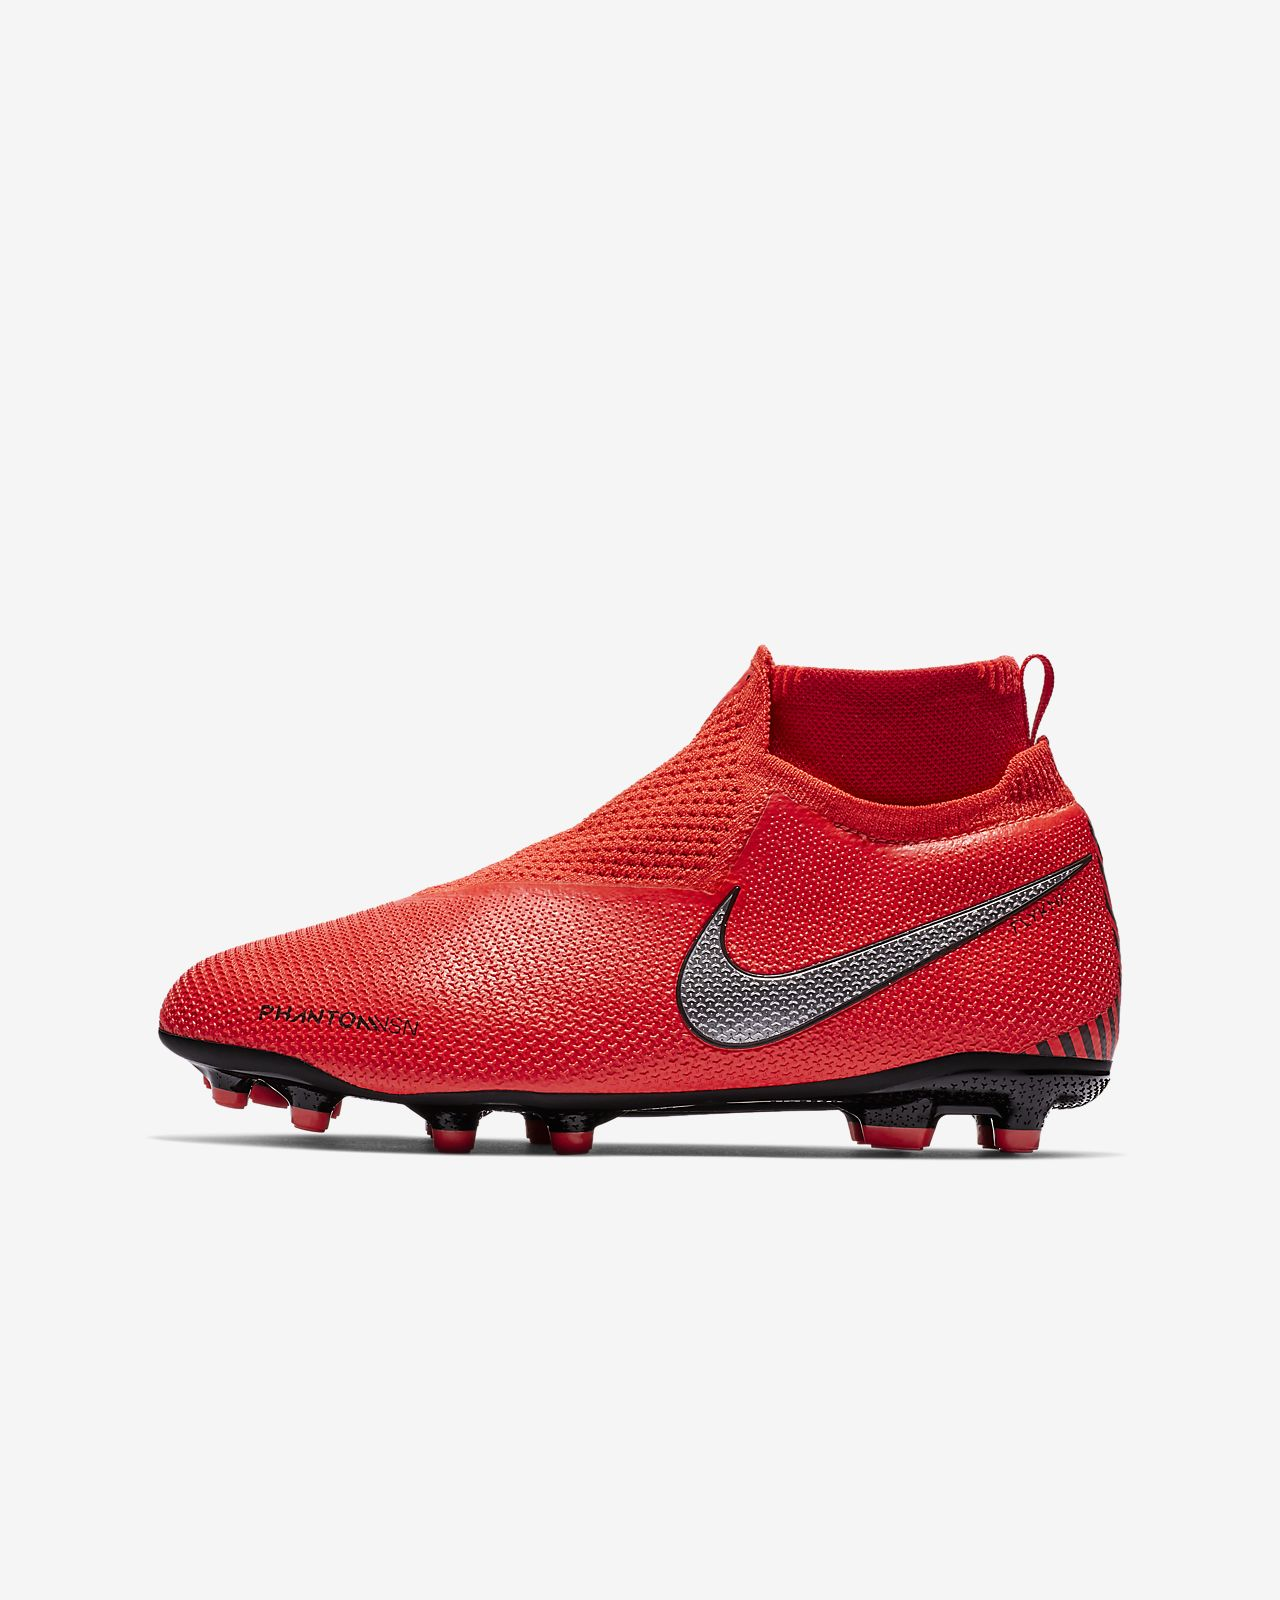 Nike Crampons Football Jr Chaussure Multi Terrains À De Phantomvsn 5qYwqBTxX